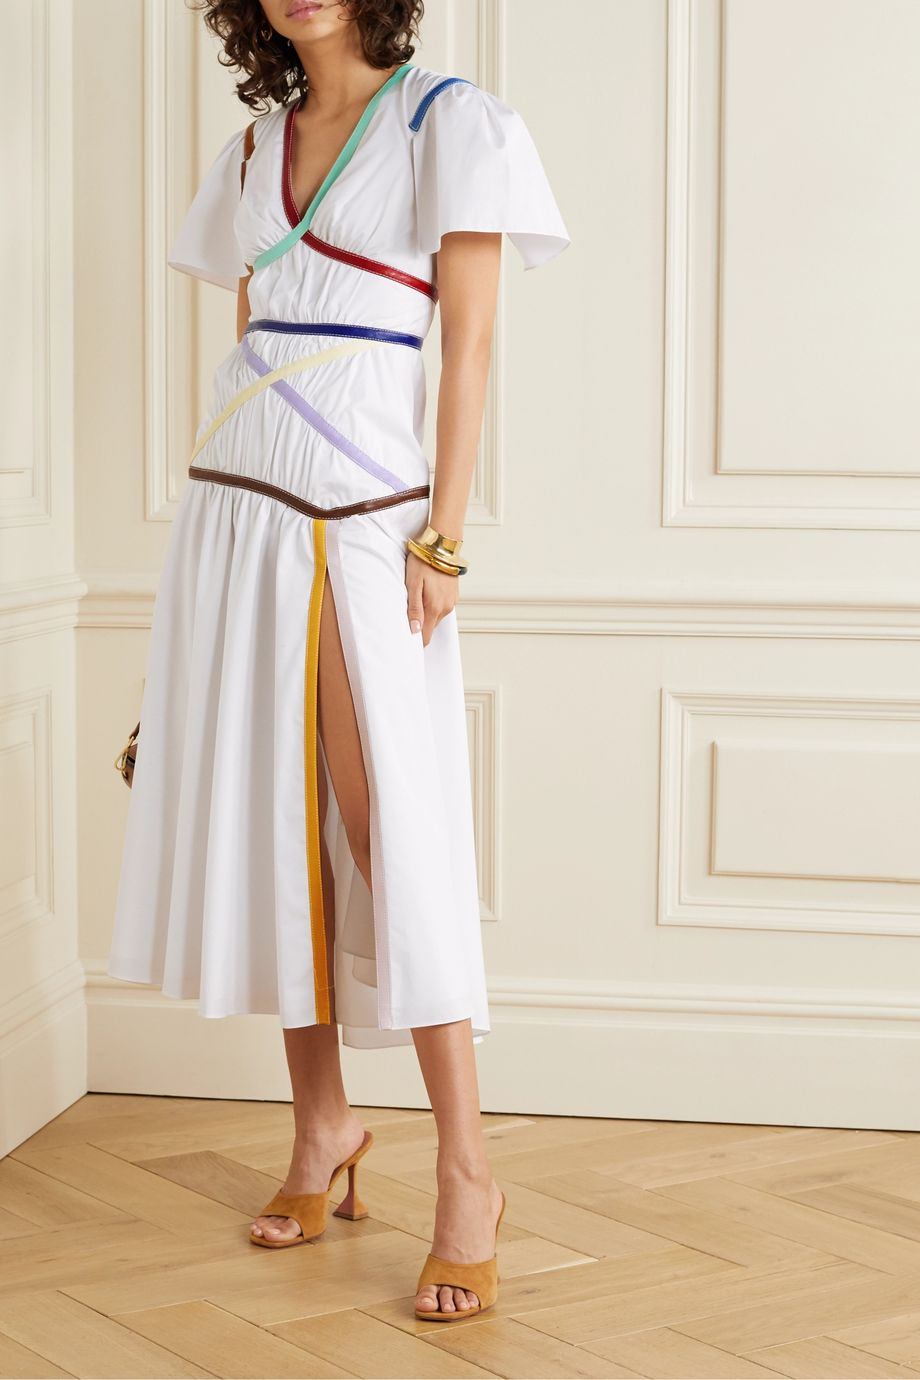 Rosie Assoulin Criss Cross Applesauce faux leather-trimmed cotton-blend poplin midi dress